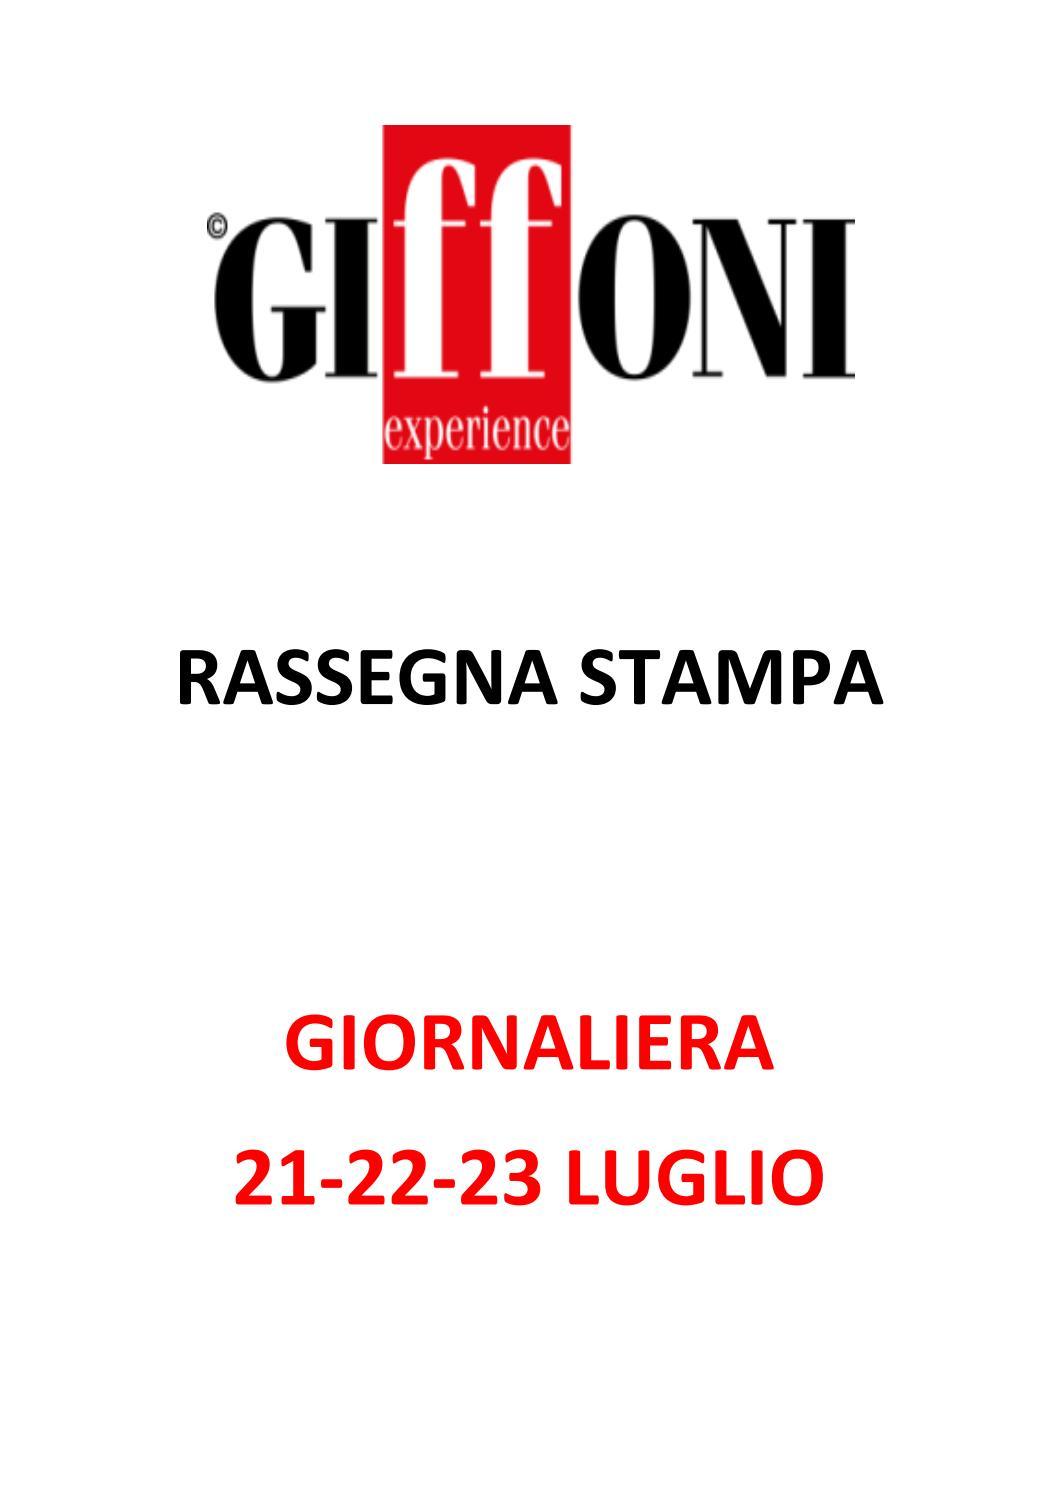 Rassegna Stampa 21 23 Luglio 2018 By Giffoni Experience Issuu